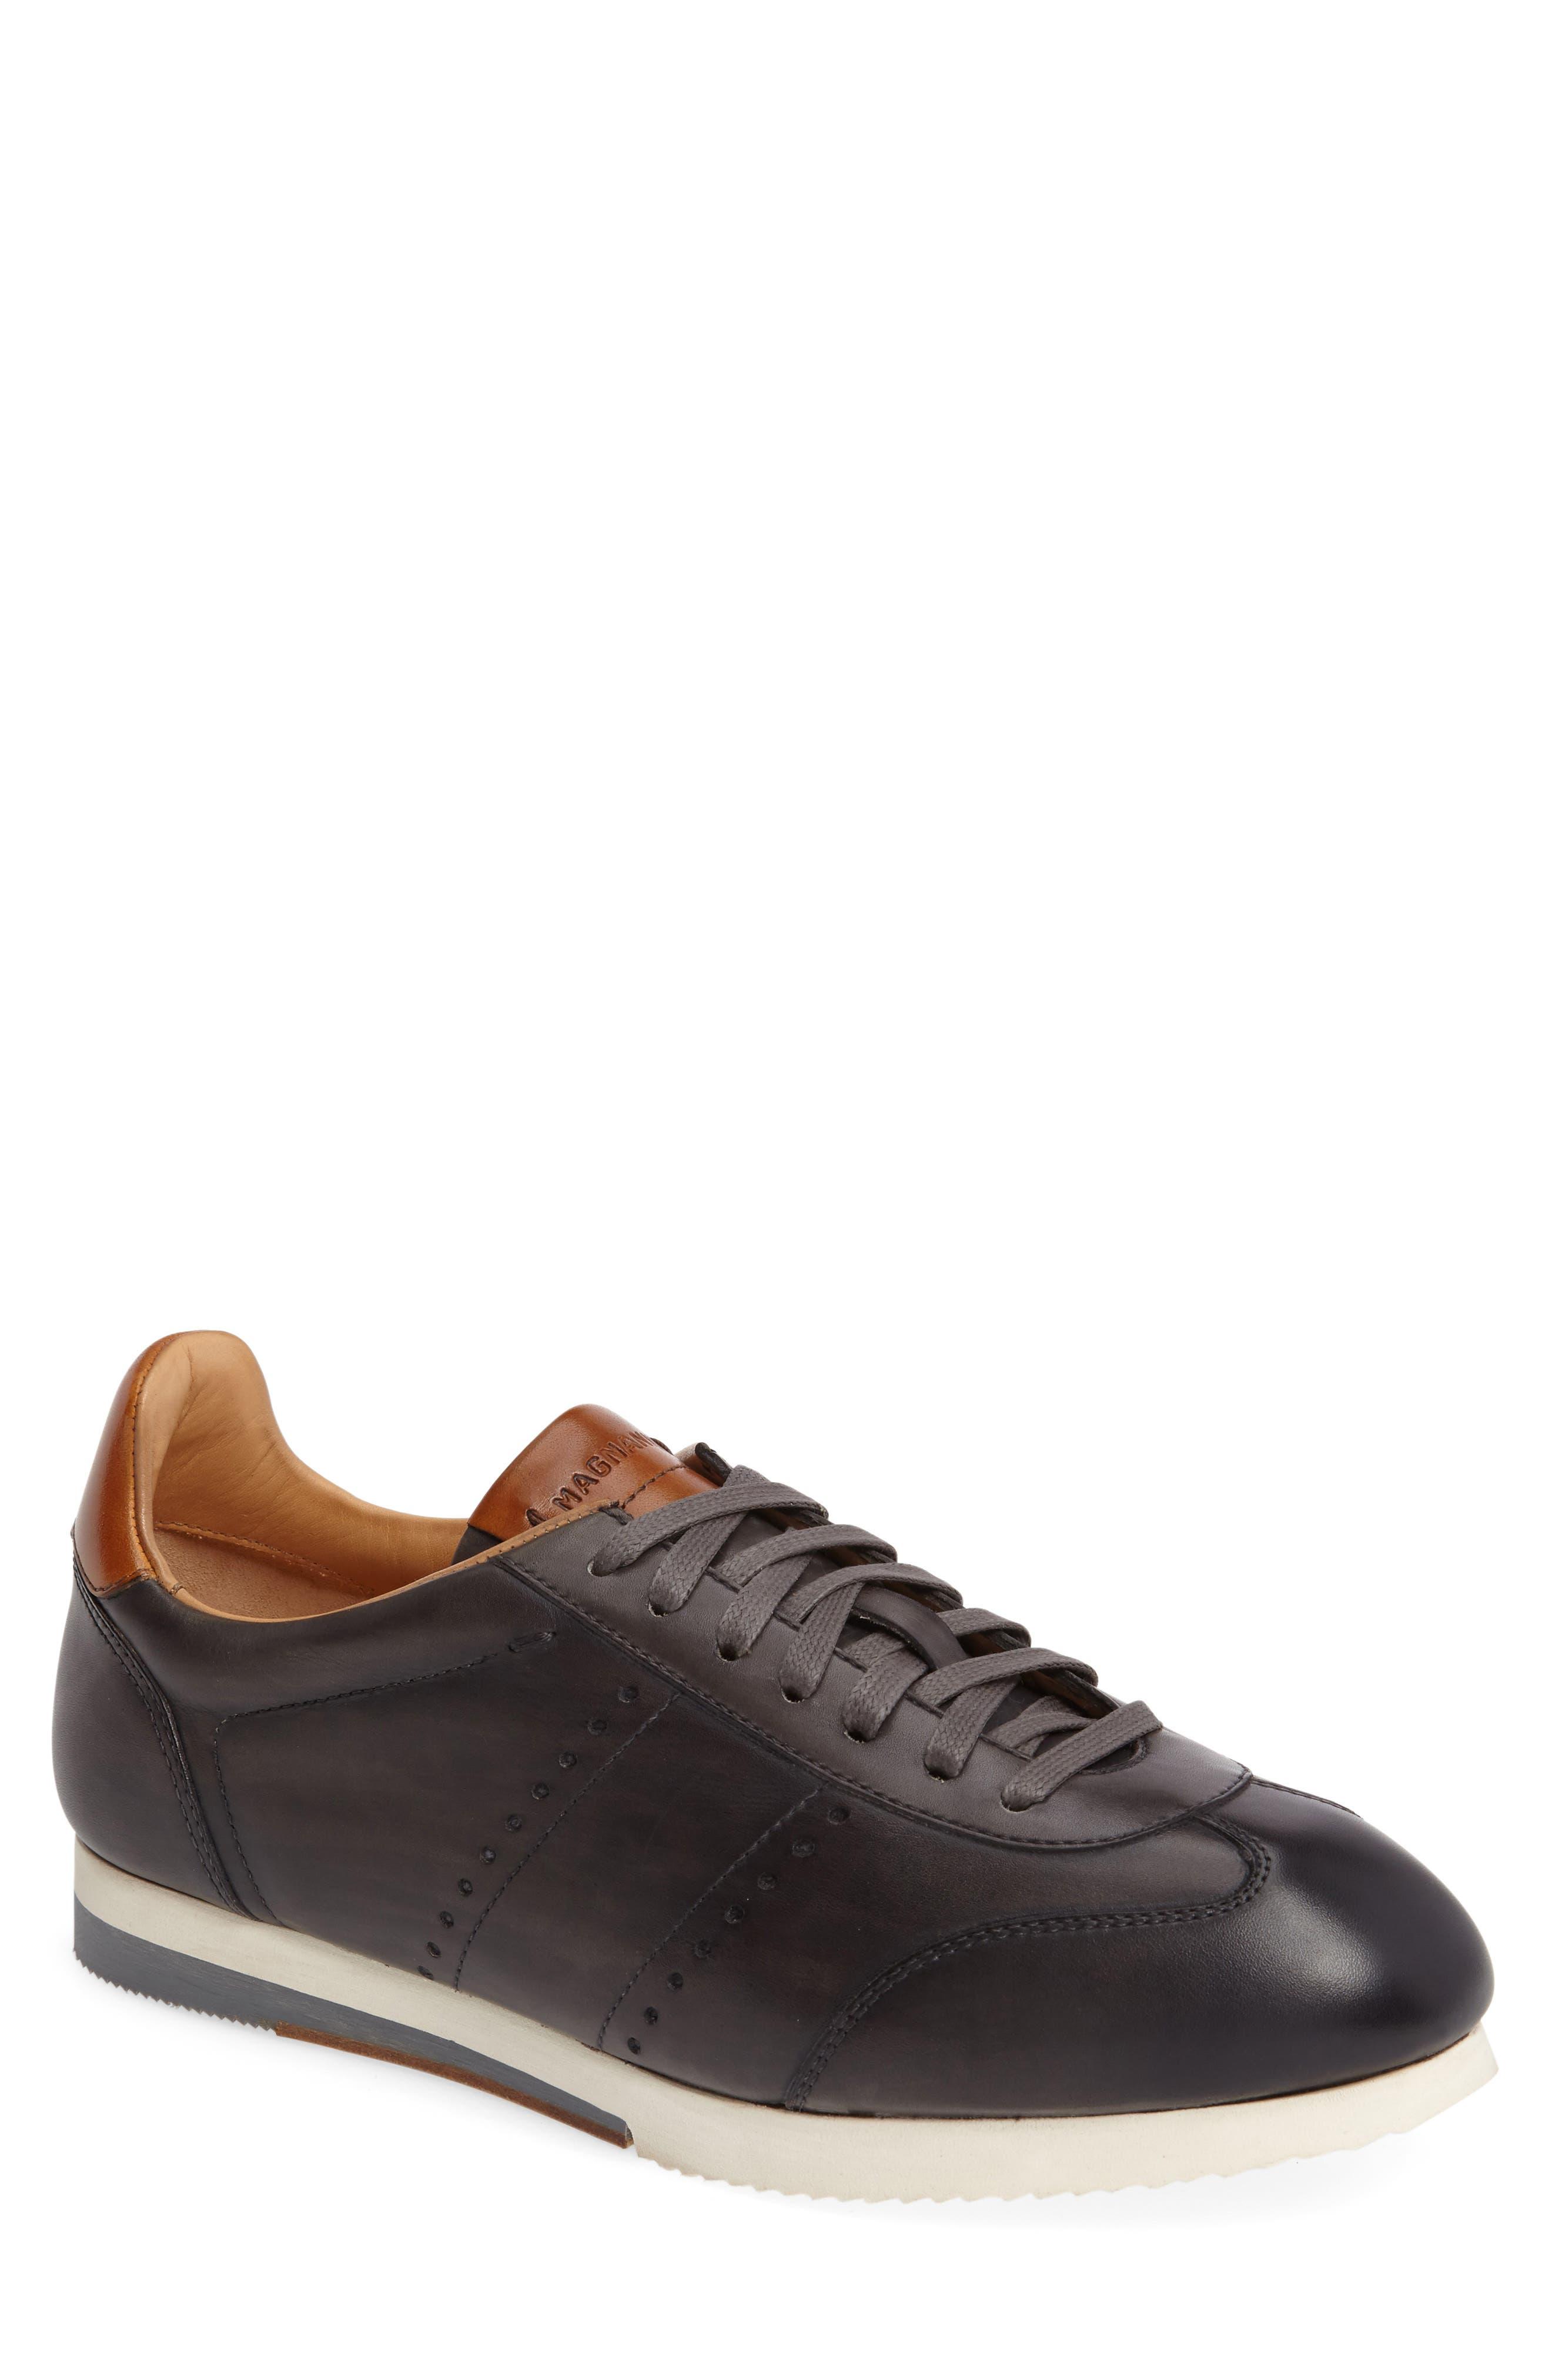 Magnanni Isco Sneaker (Men)